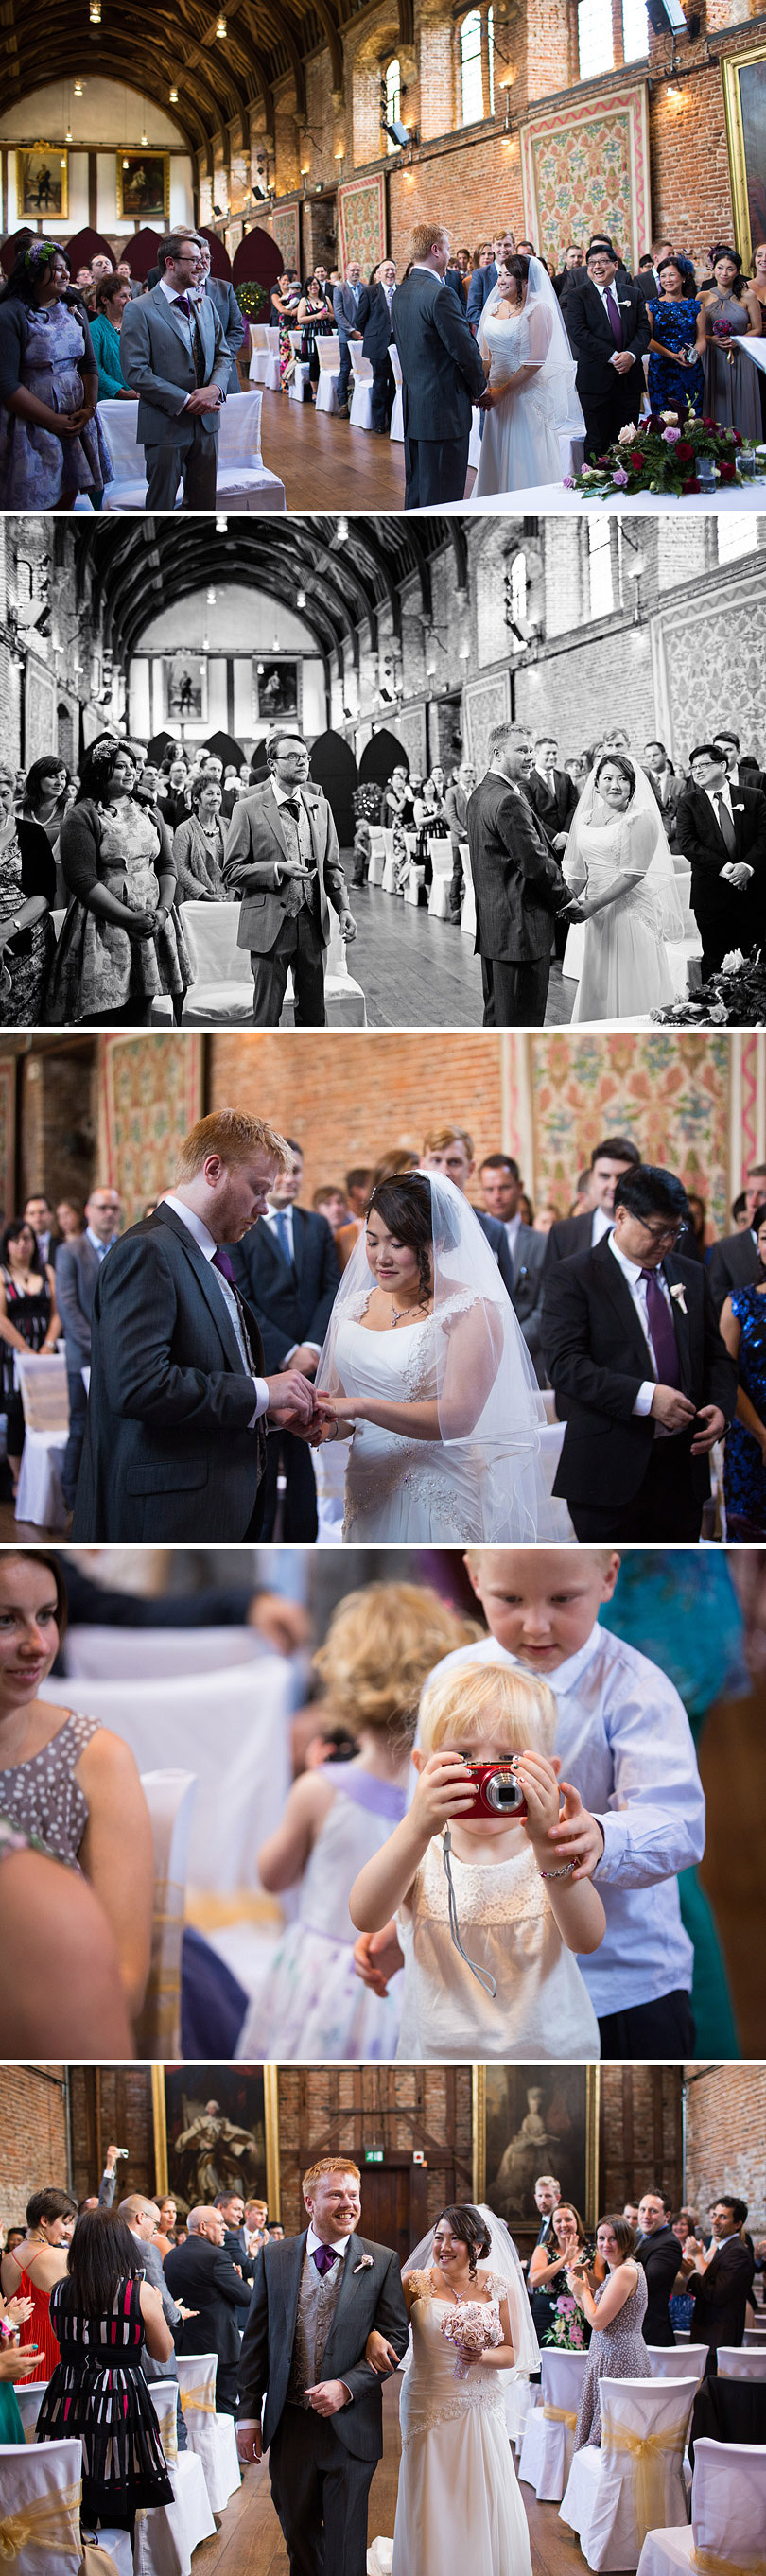 E&R_Hatfield-House-Wedding_09.jpg